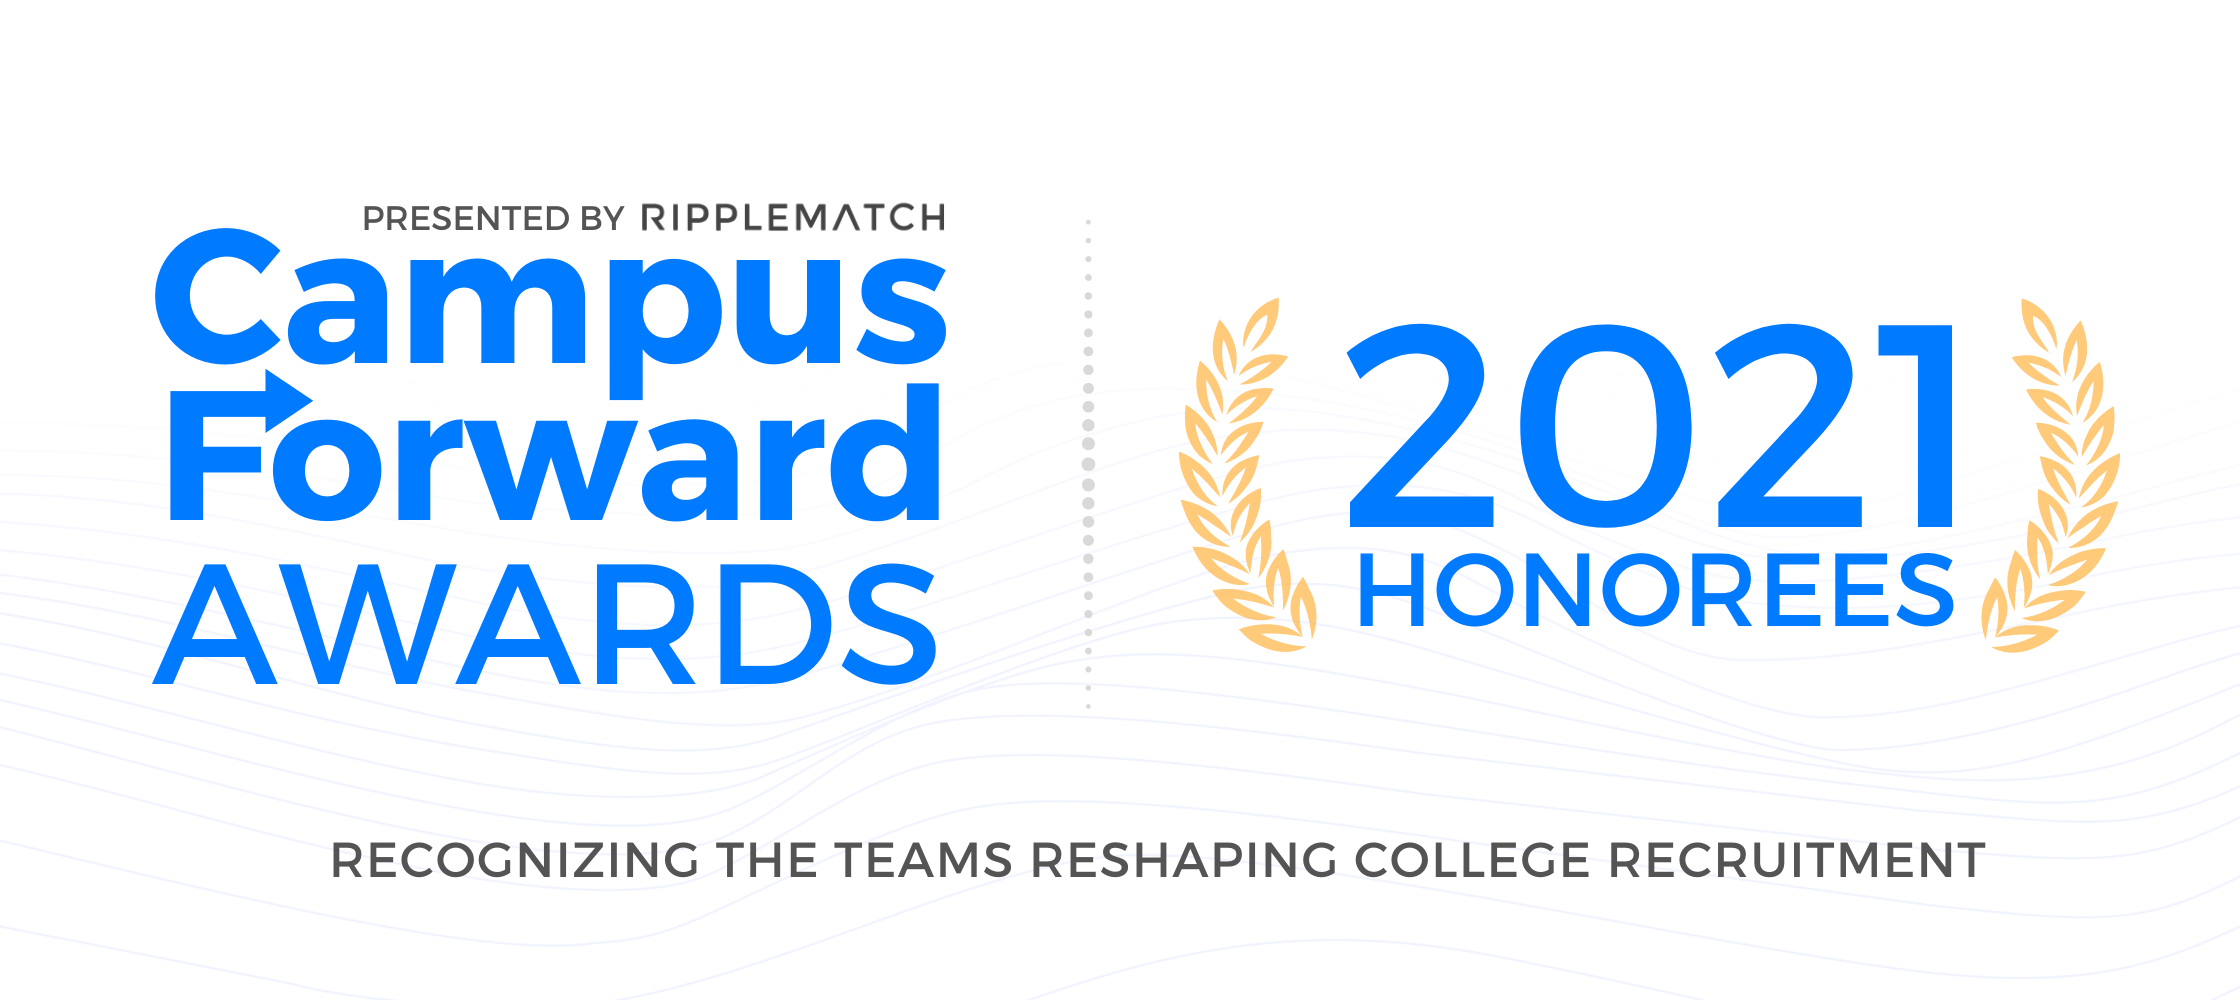 Campus Forward Awards